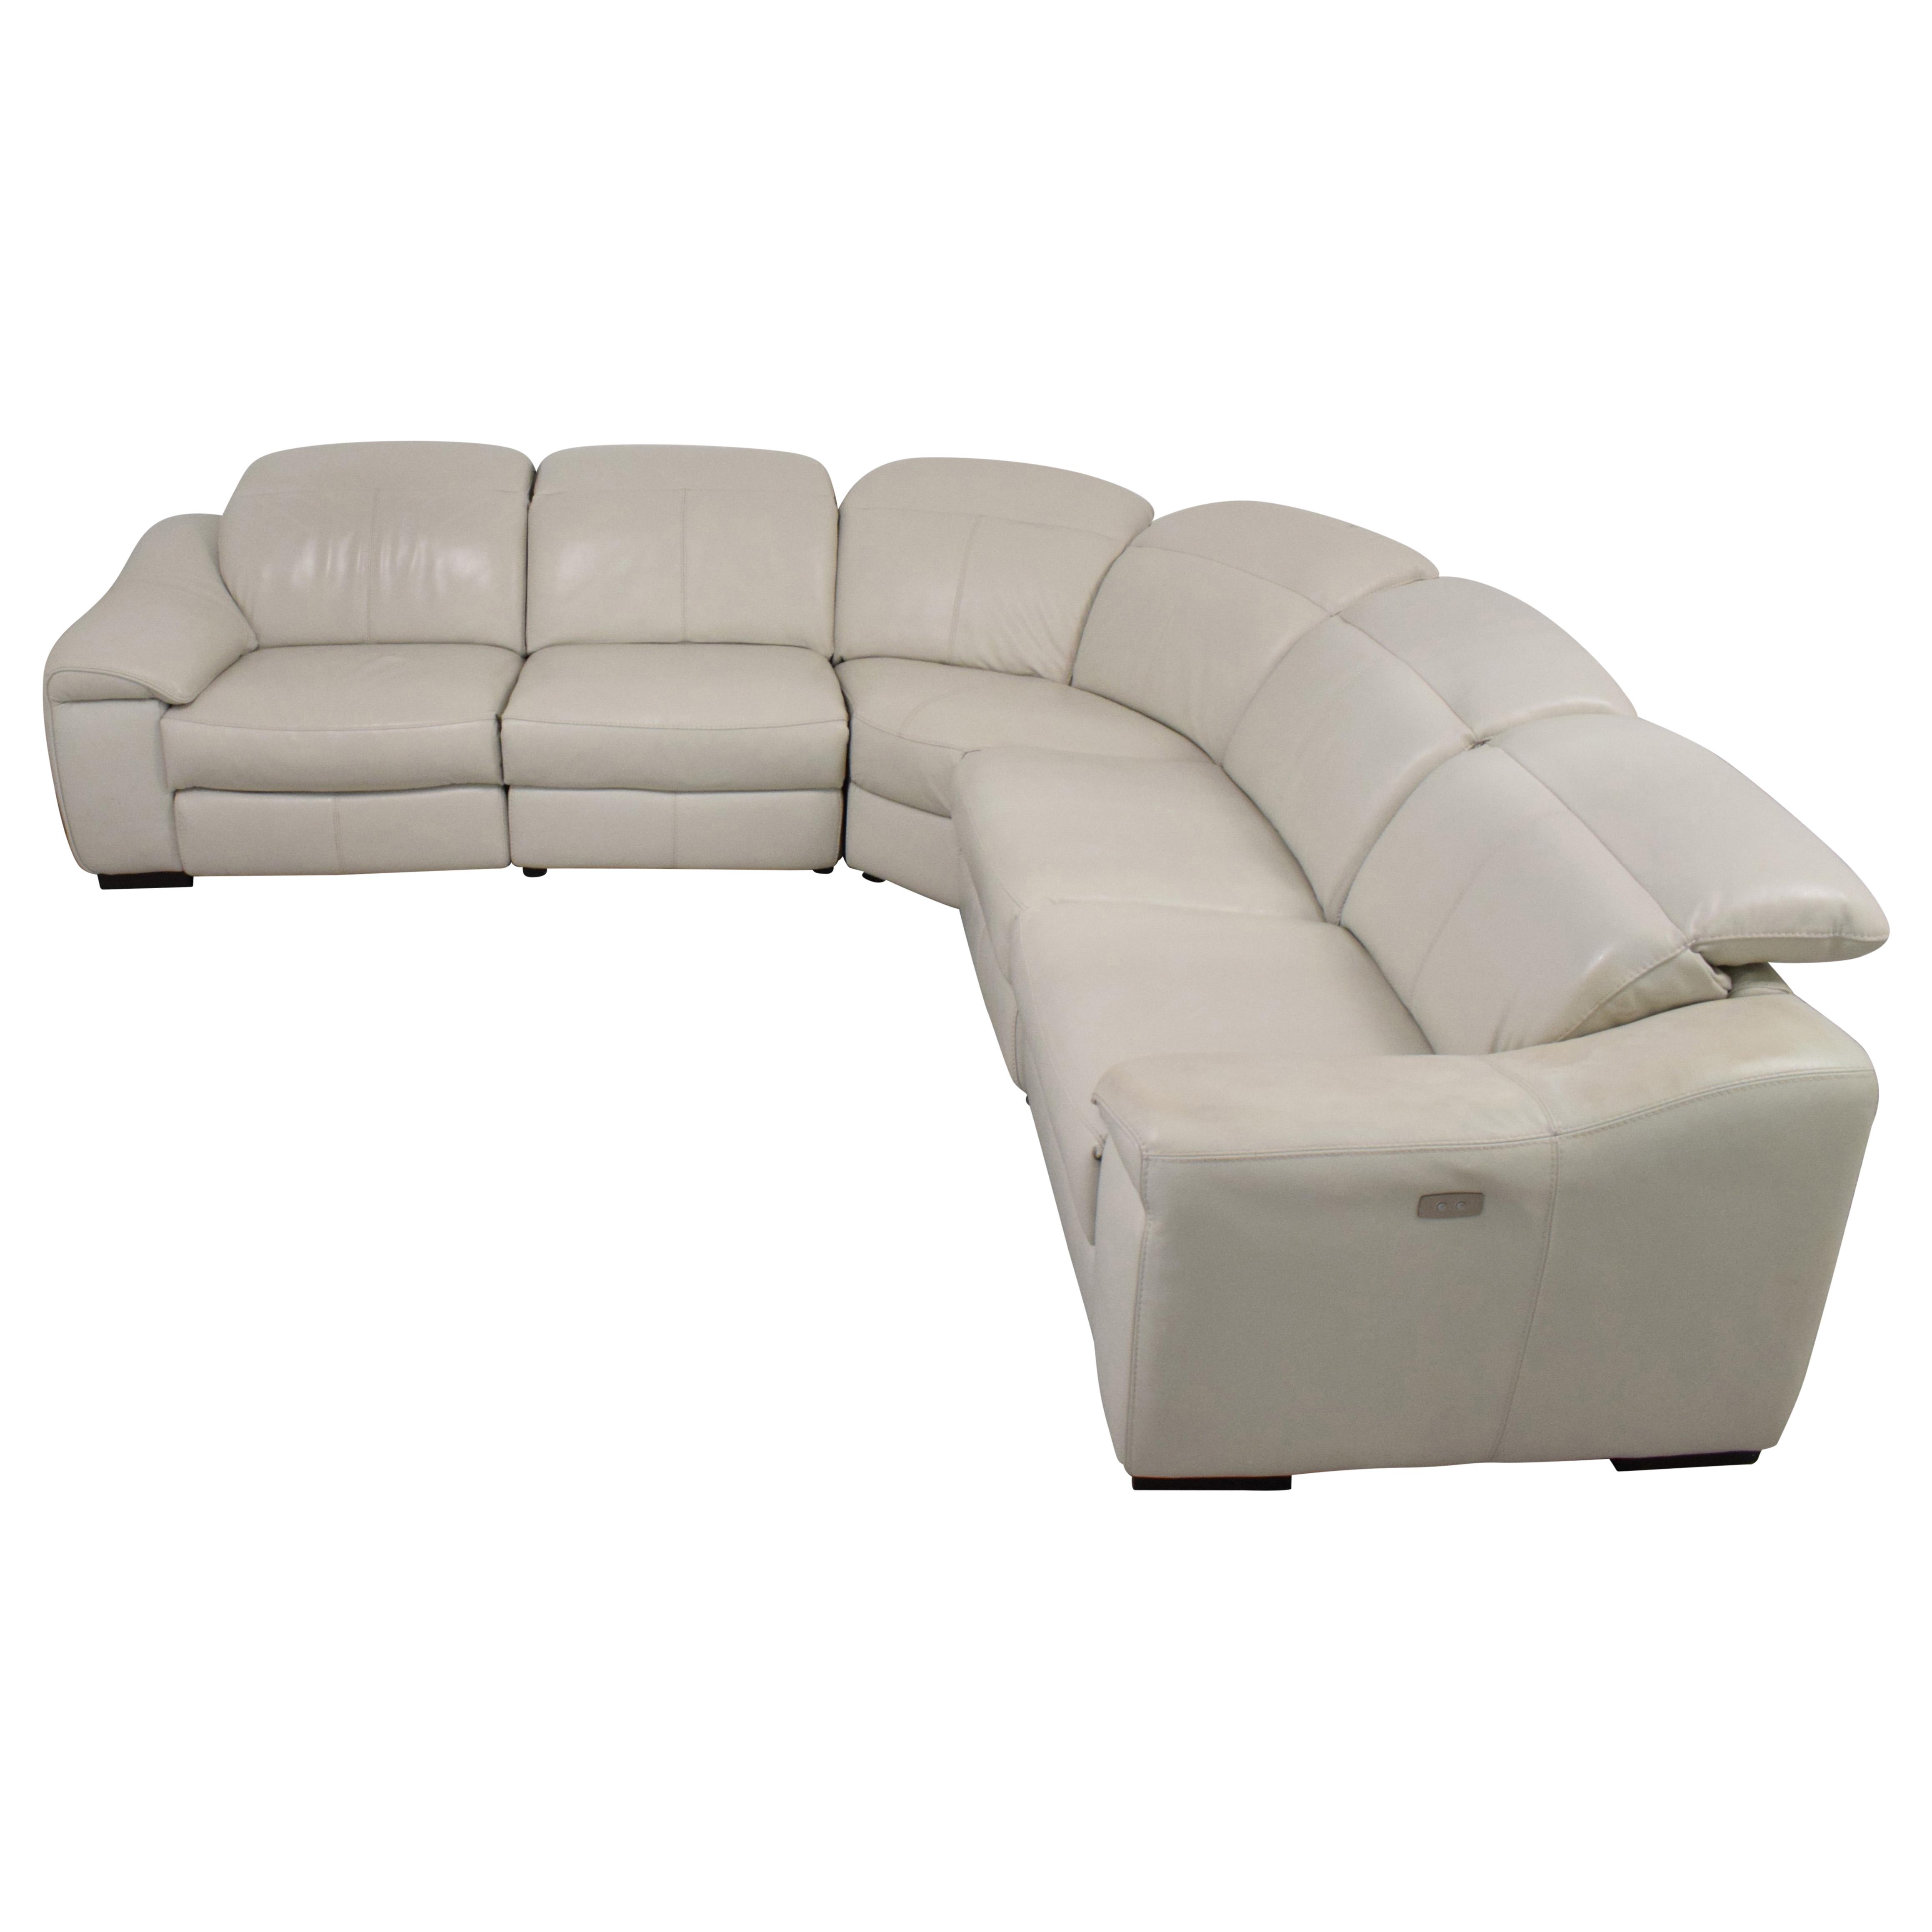 Macy's Macy's Power Reclining Sectional Sofa pa